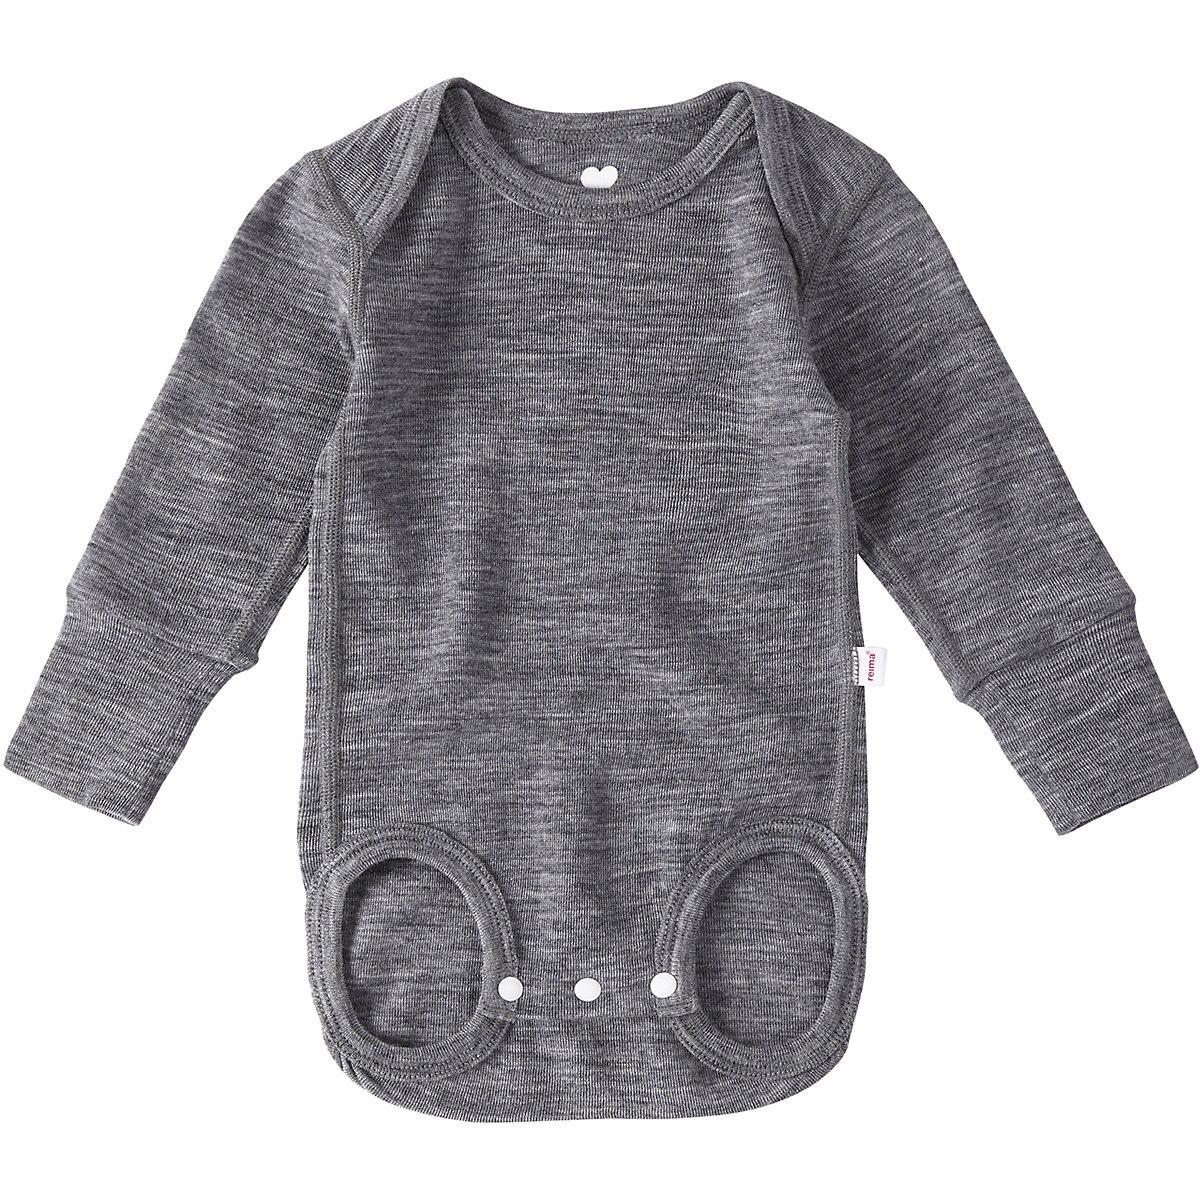 Reima Bodysuits 6908447 bodysuits for children burgundy lace up design deep v neck long sleeves bodysuits